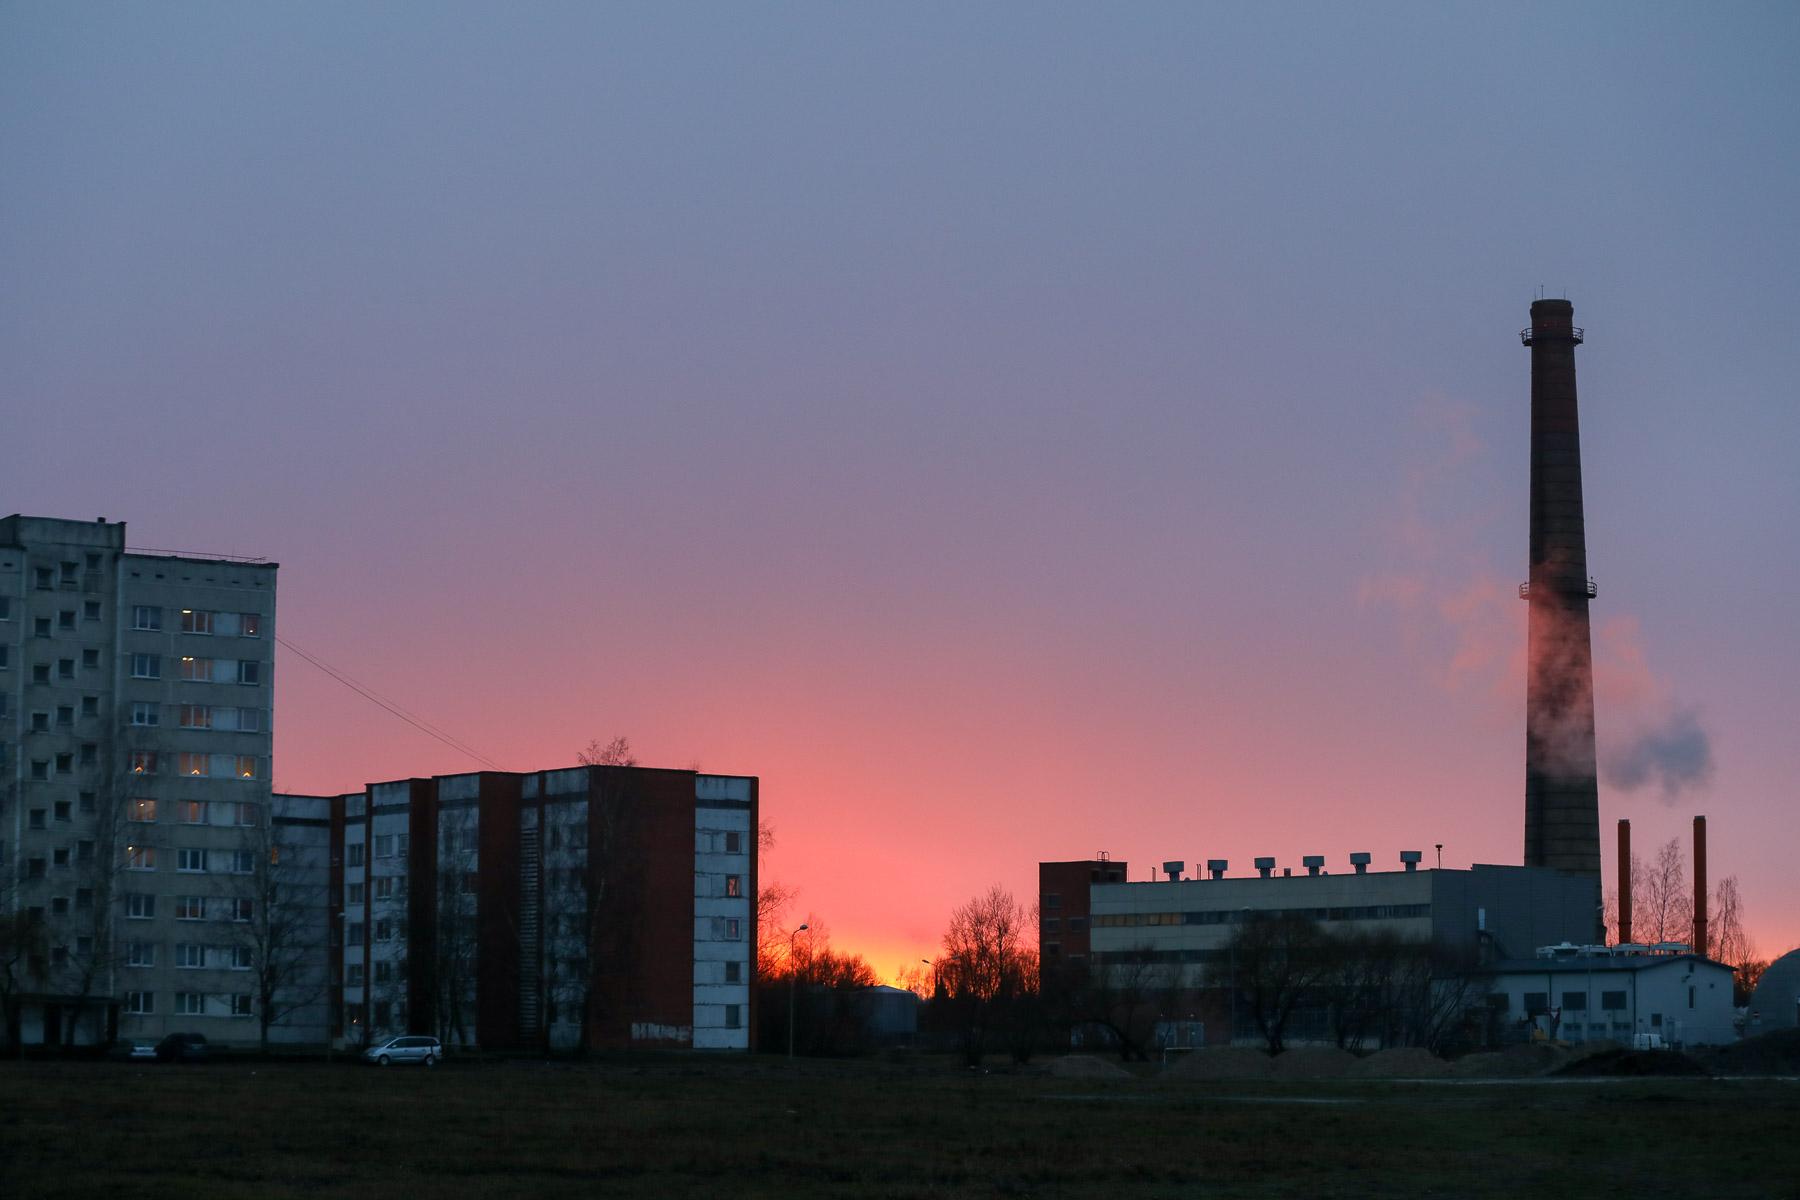 Landscape-cityscape-photography-jelgava-latvia-blocs-blocks-flat-post-soviet--Советские-квартиры-спальный-район-Латвия-город-фотограф-natalia-smith-photography-0100.jpg